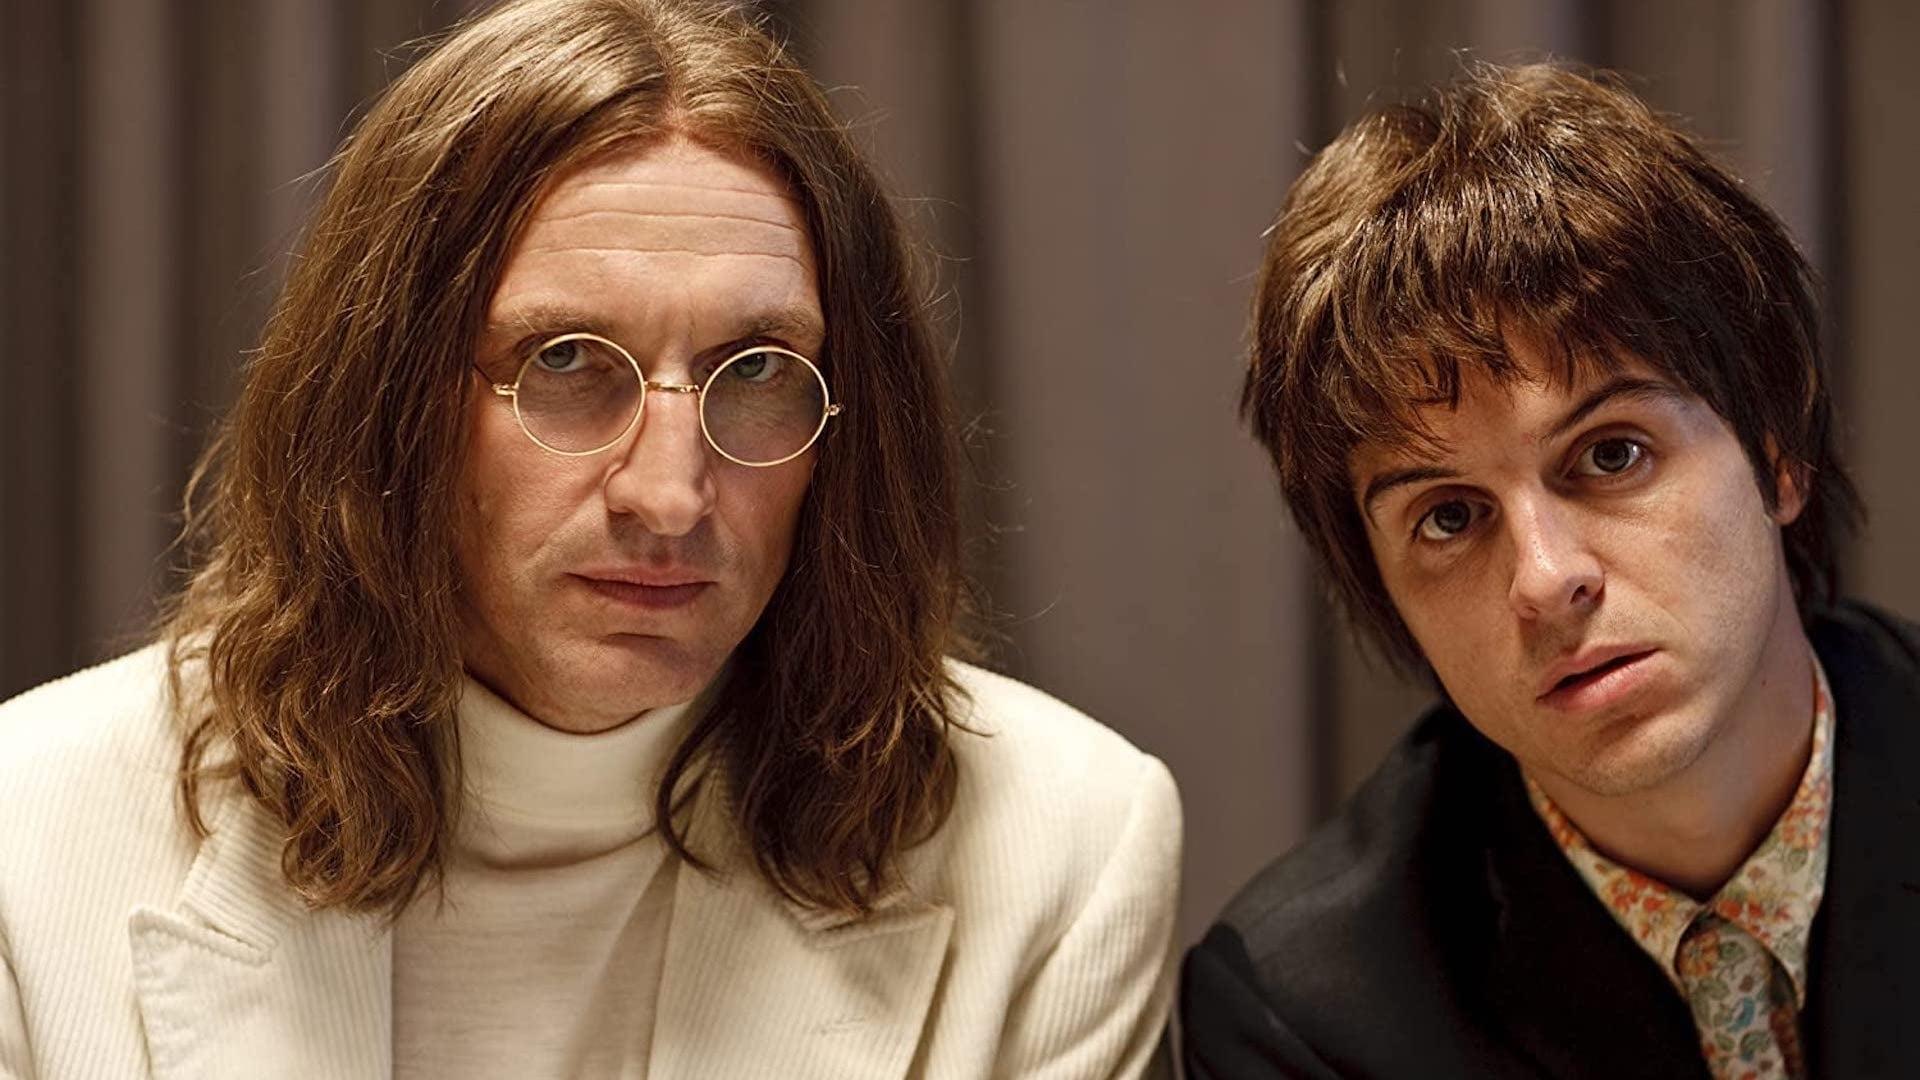 Lennon Naked Trailer: ohnotheydidnt — LiveJournal